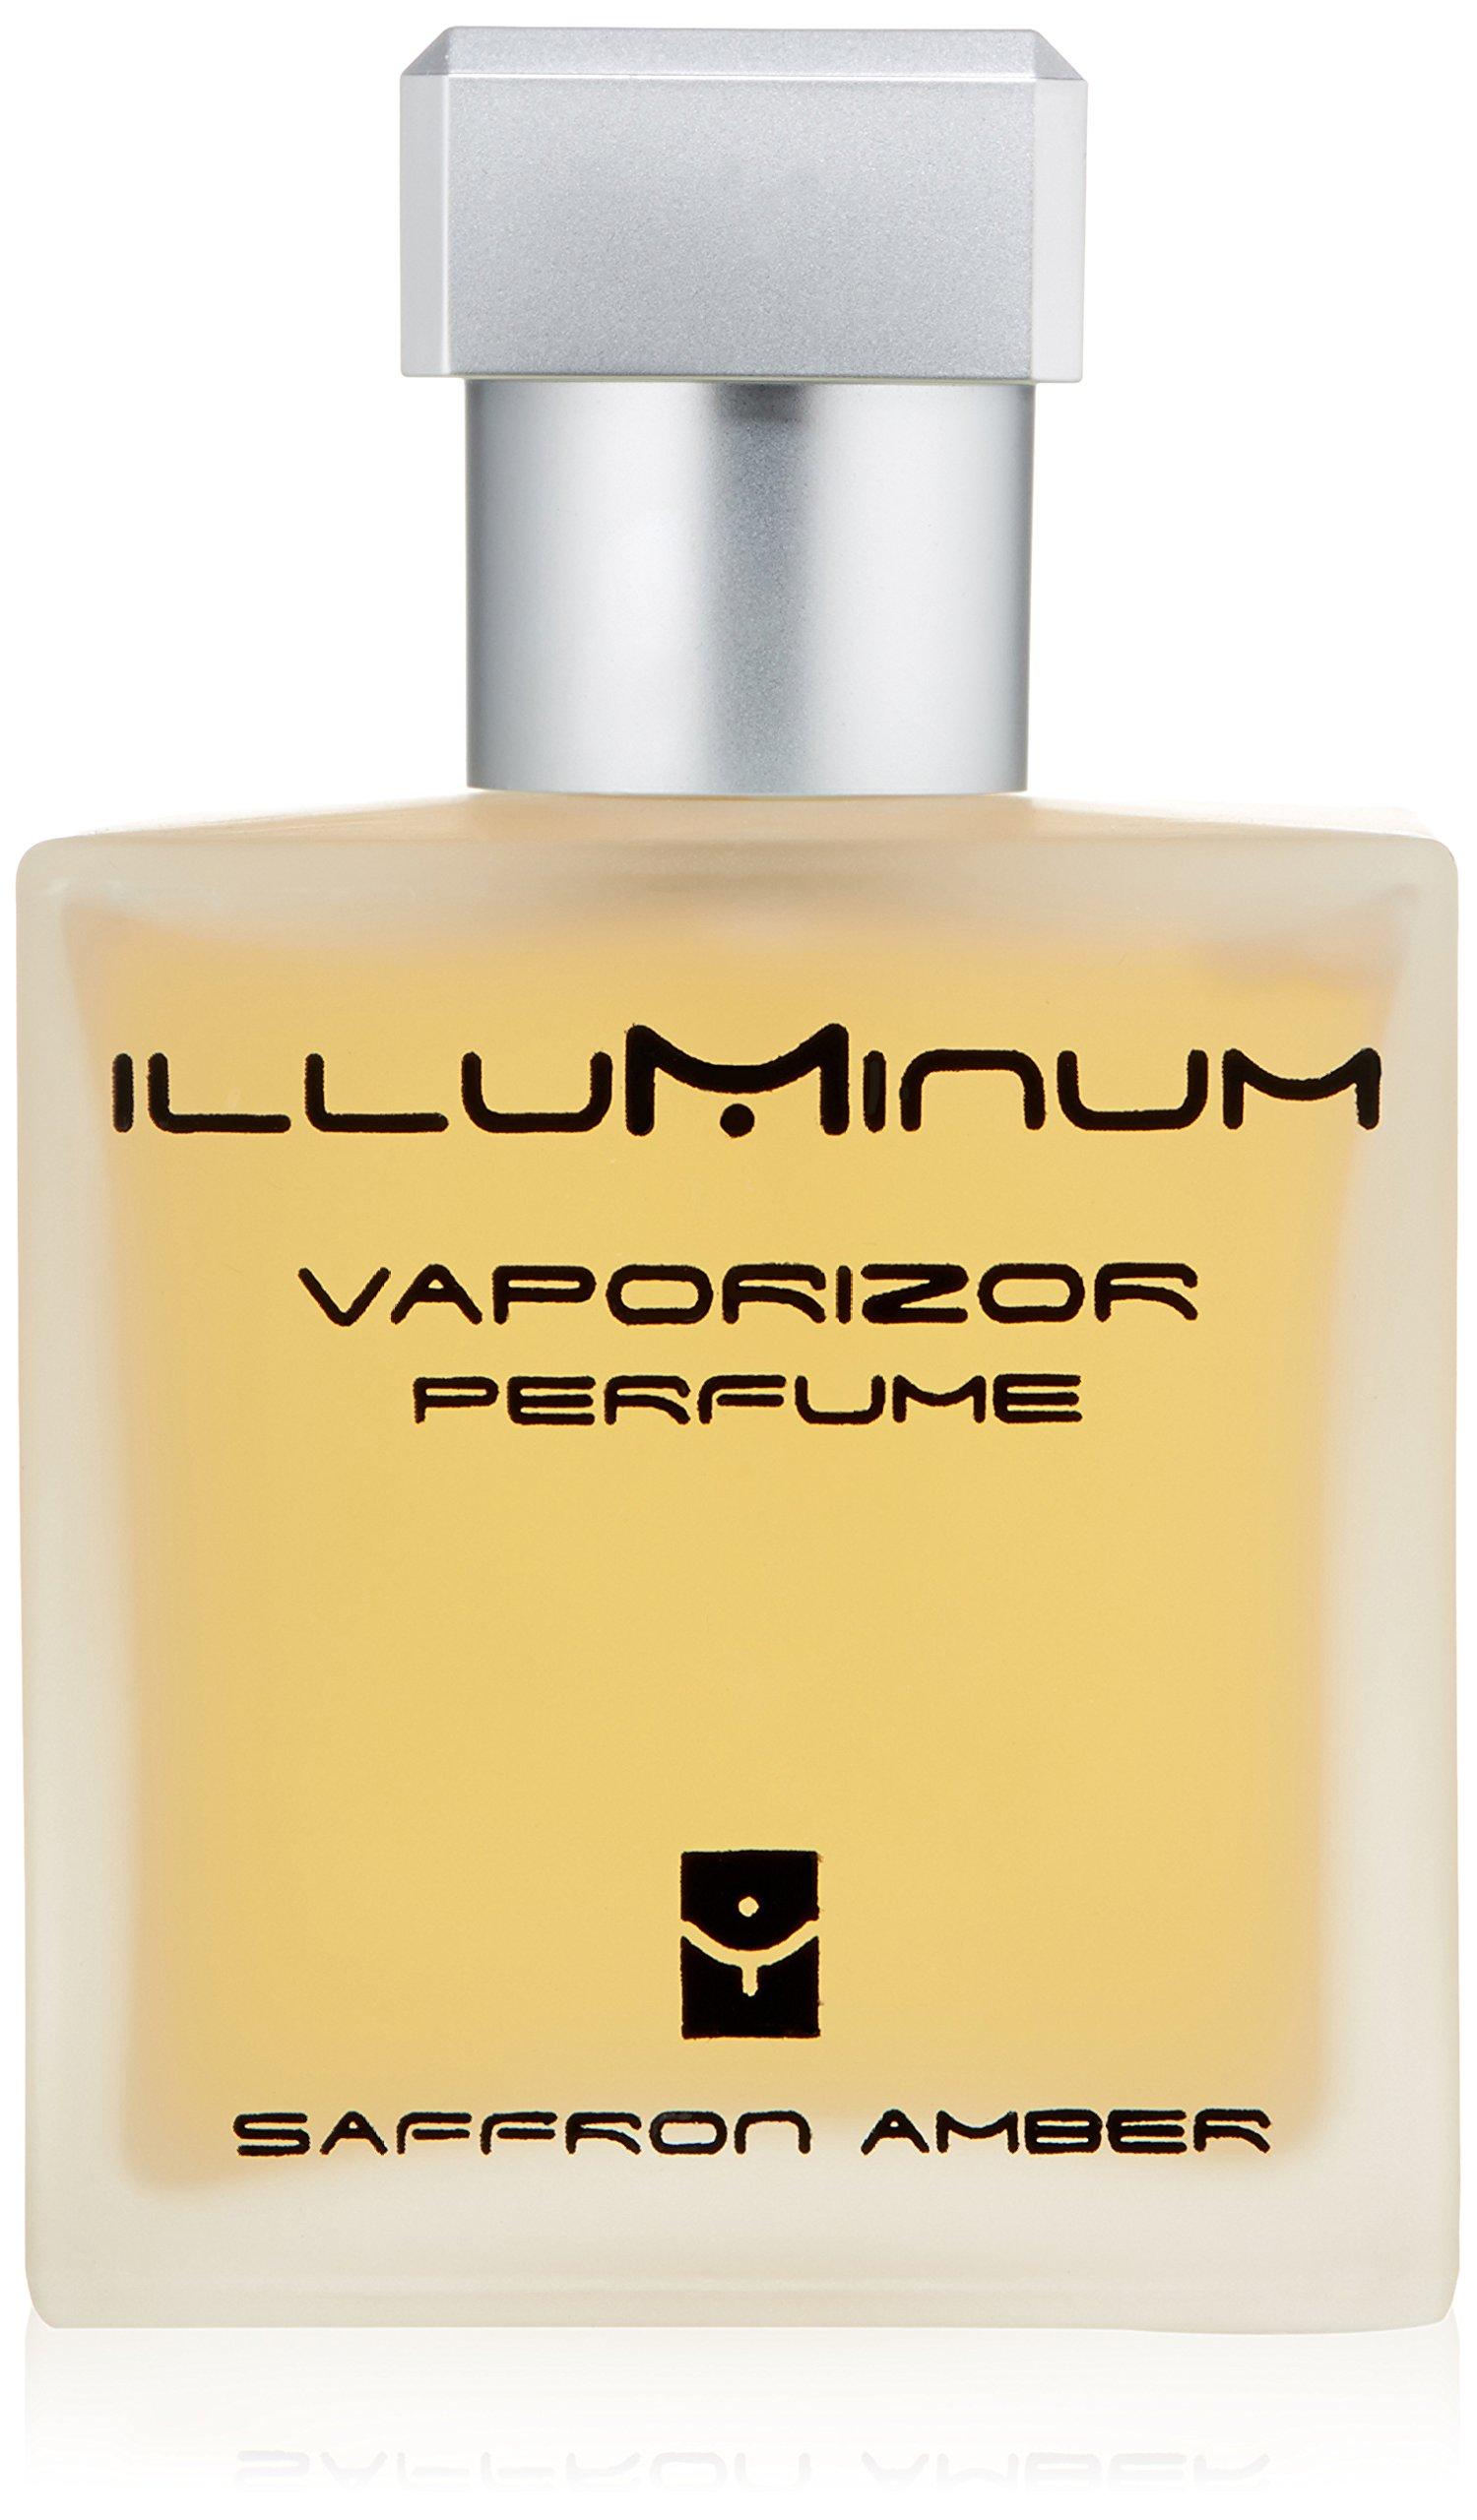 Illuminum Vaporizor Perfume, Saffron Amber, 3.4 fl. oz.